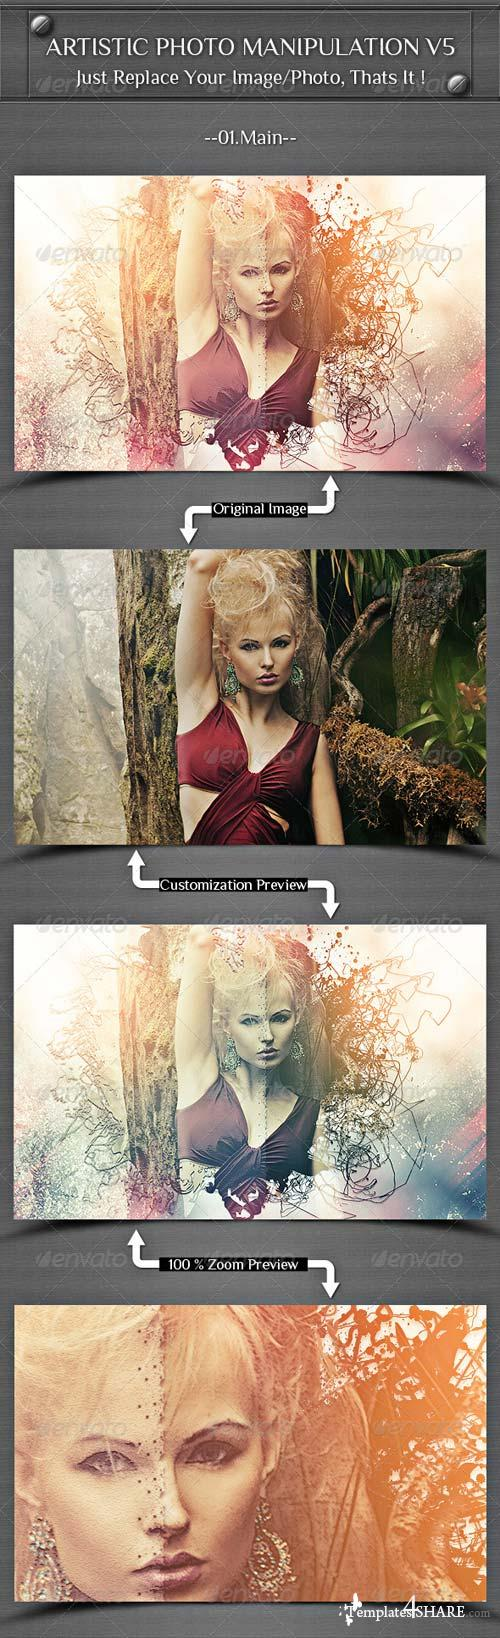 GraphicRiver Artistic Photo Manipulation V5